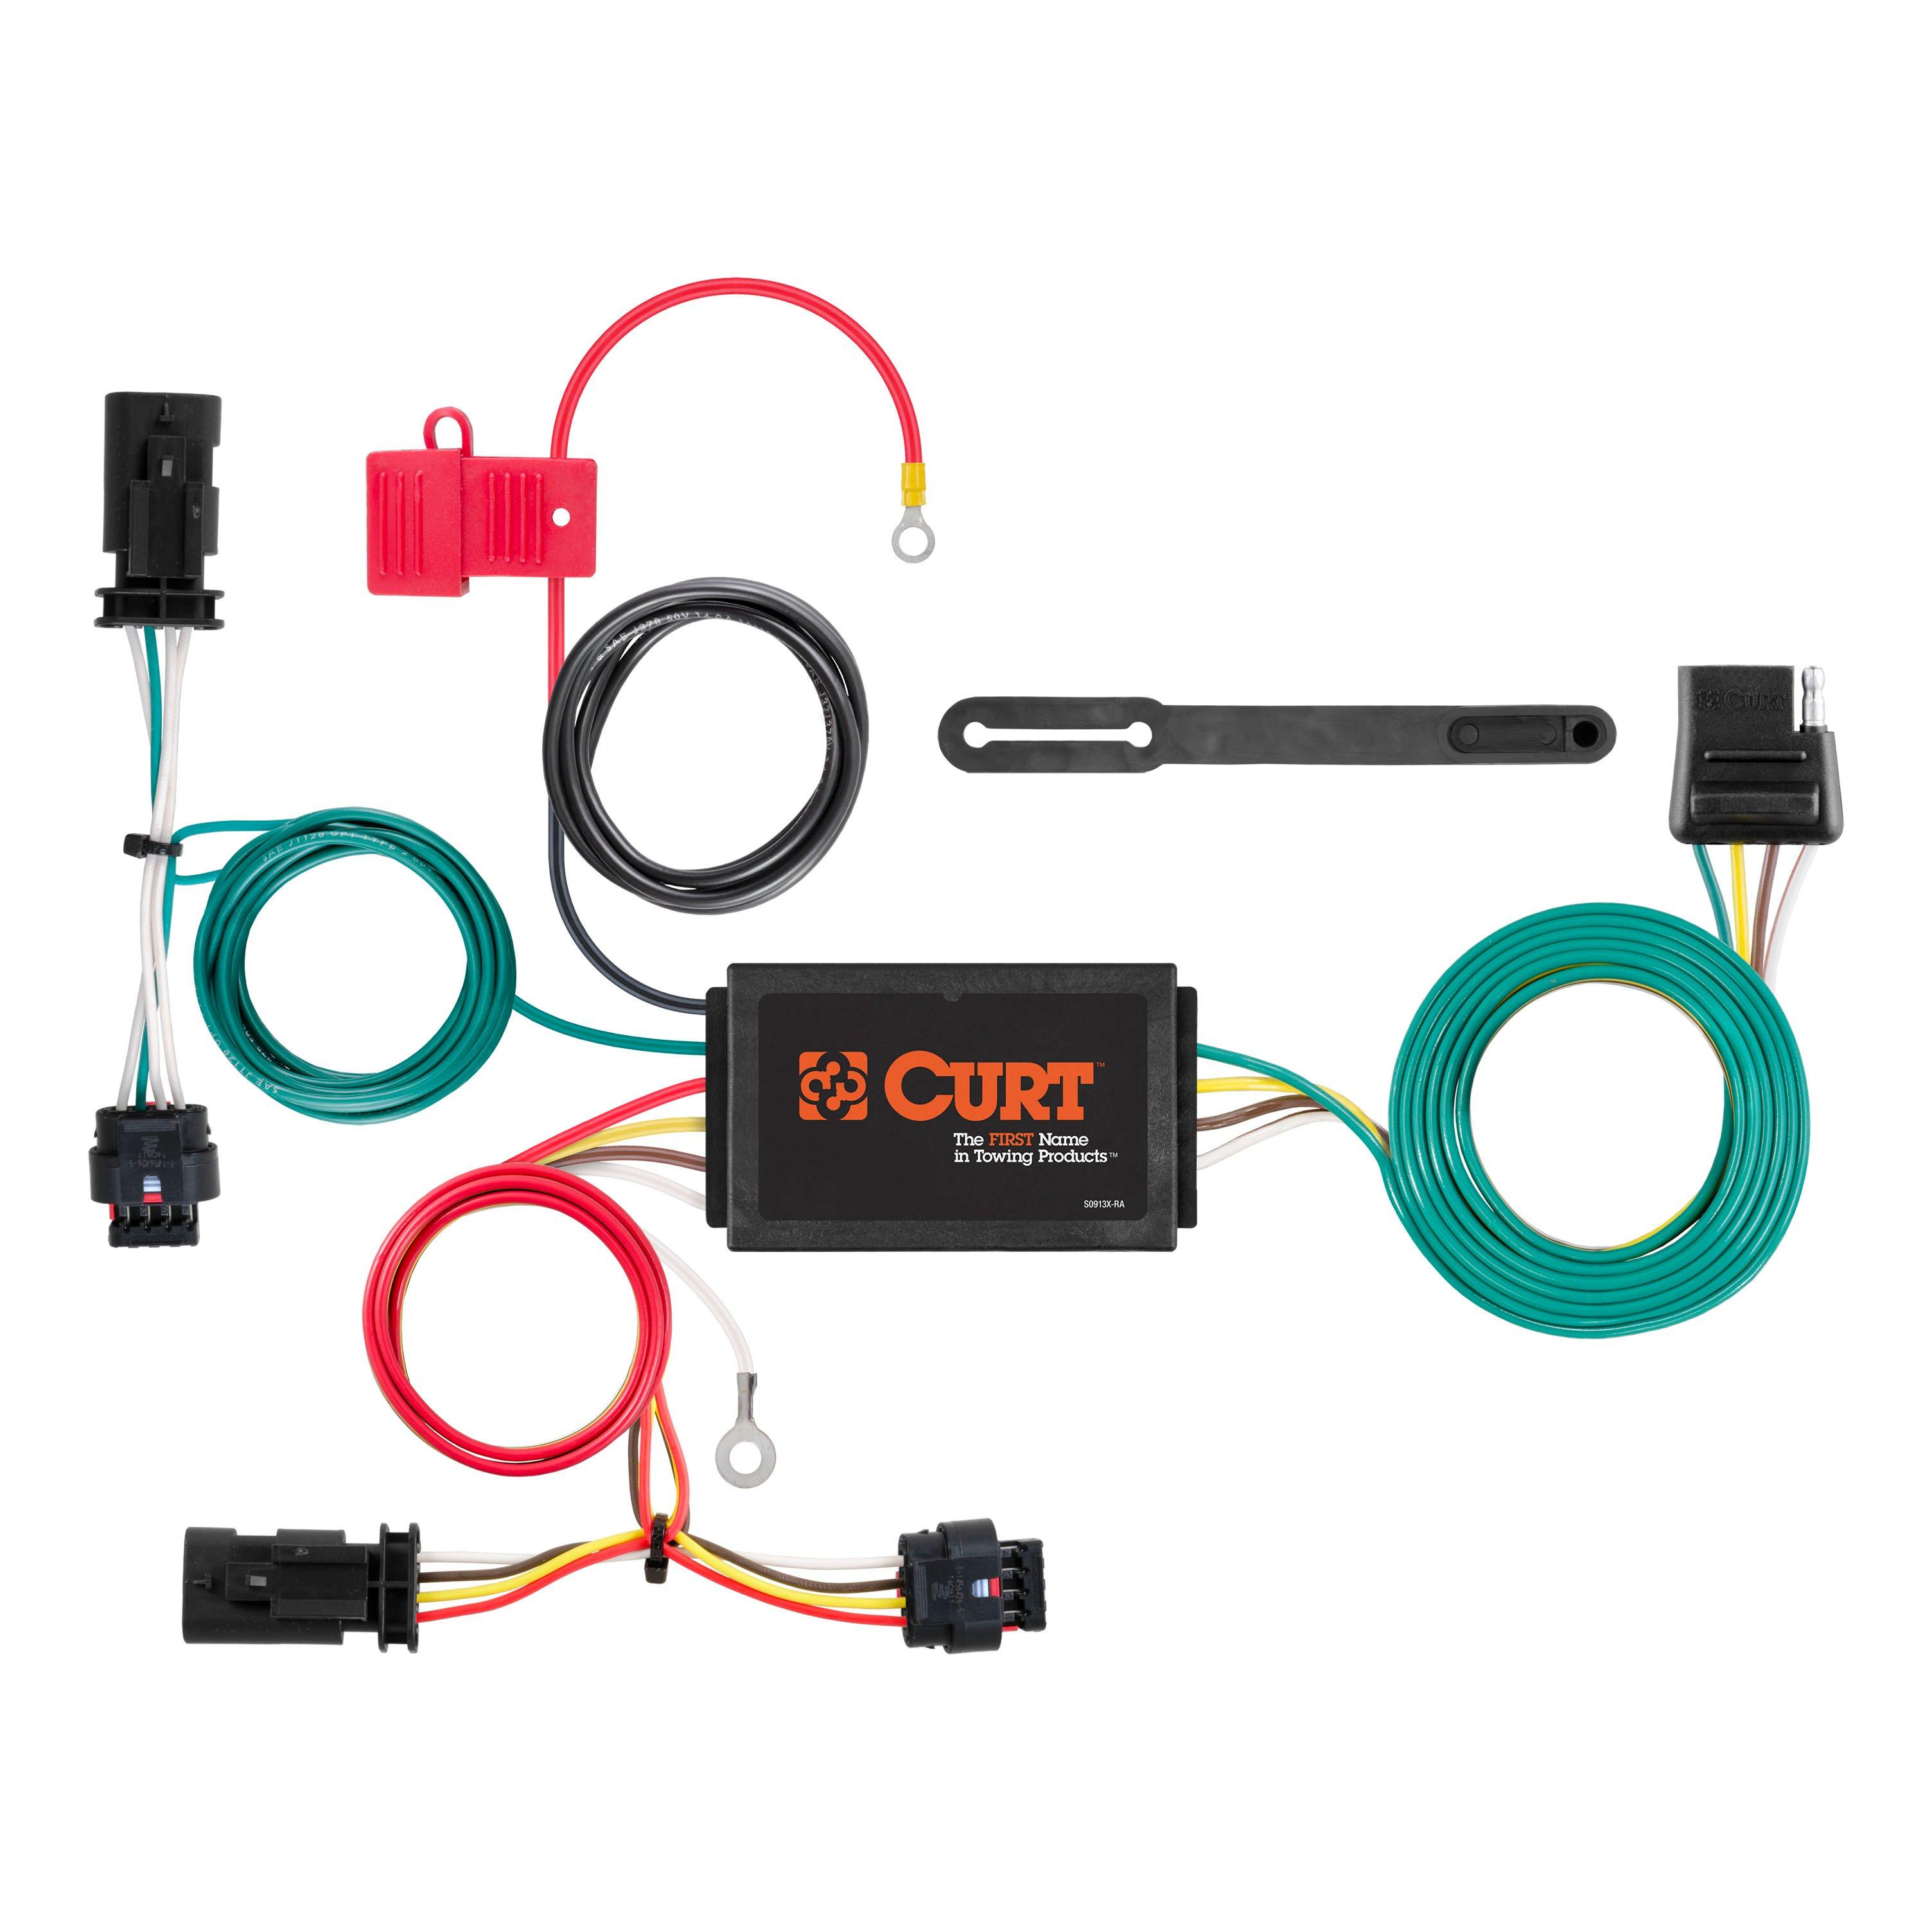 56354_3008x1990_a curt custom wiring harness 56360 curt hitch wiring harness Curt 7 Pin Wiring Harness at bayanpartner.co